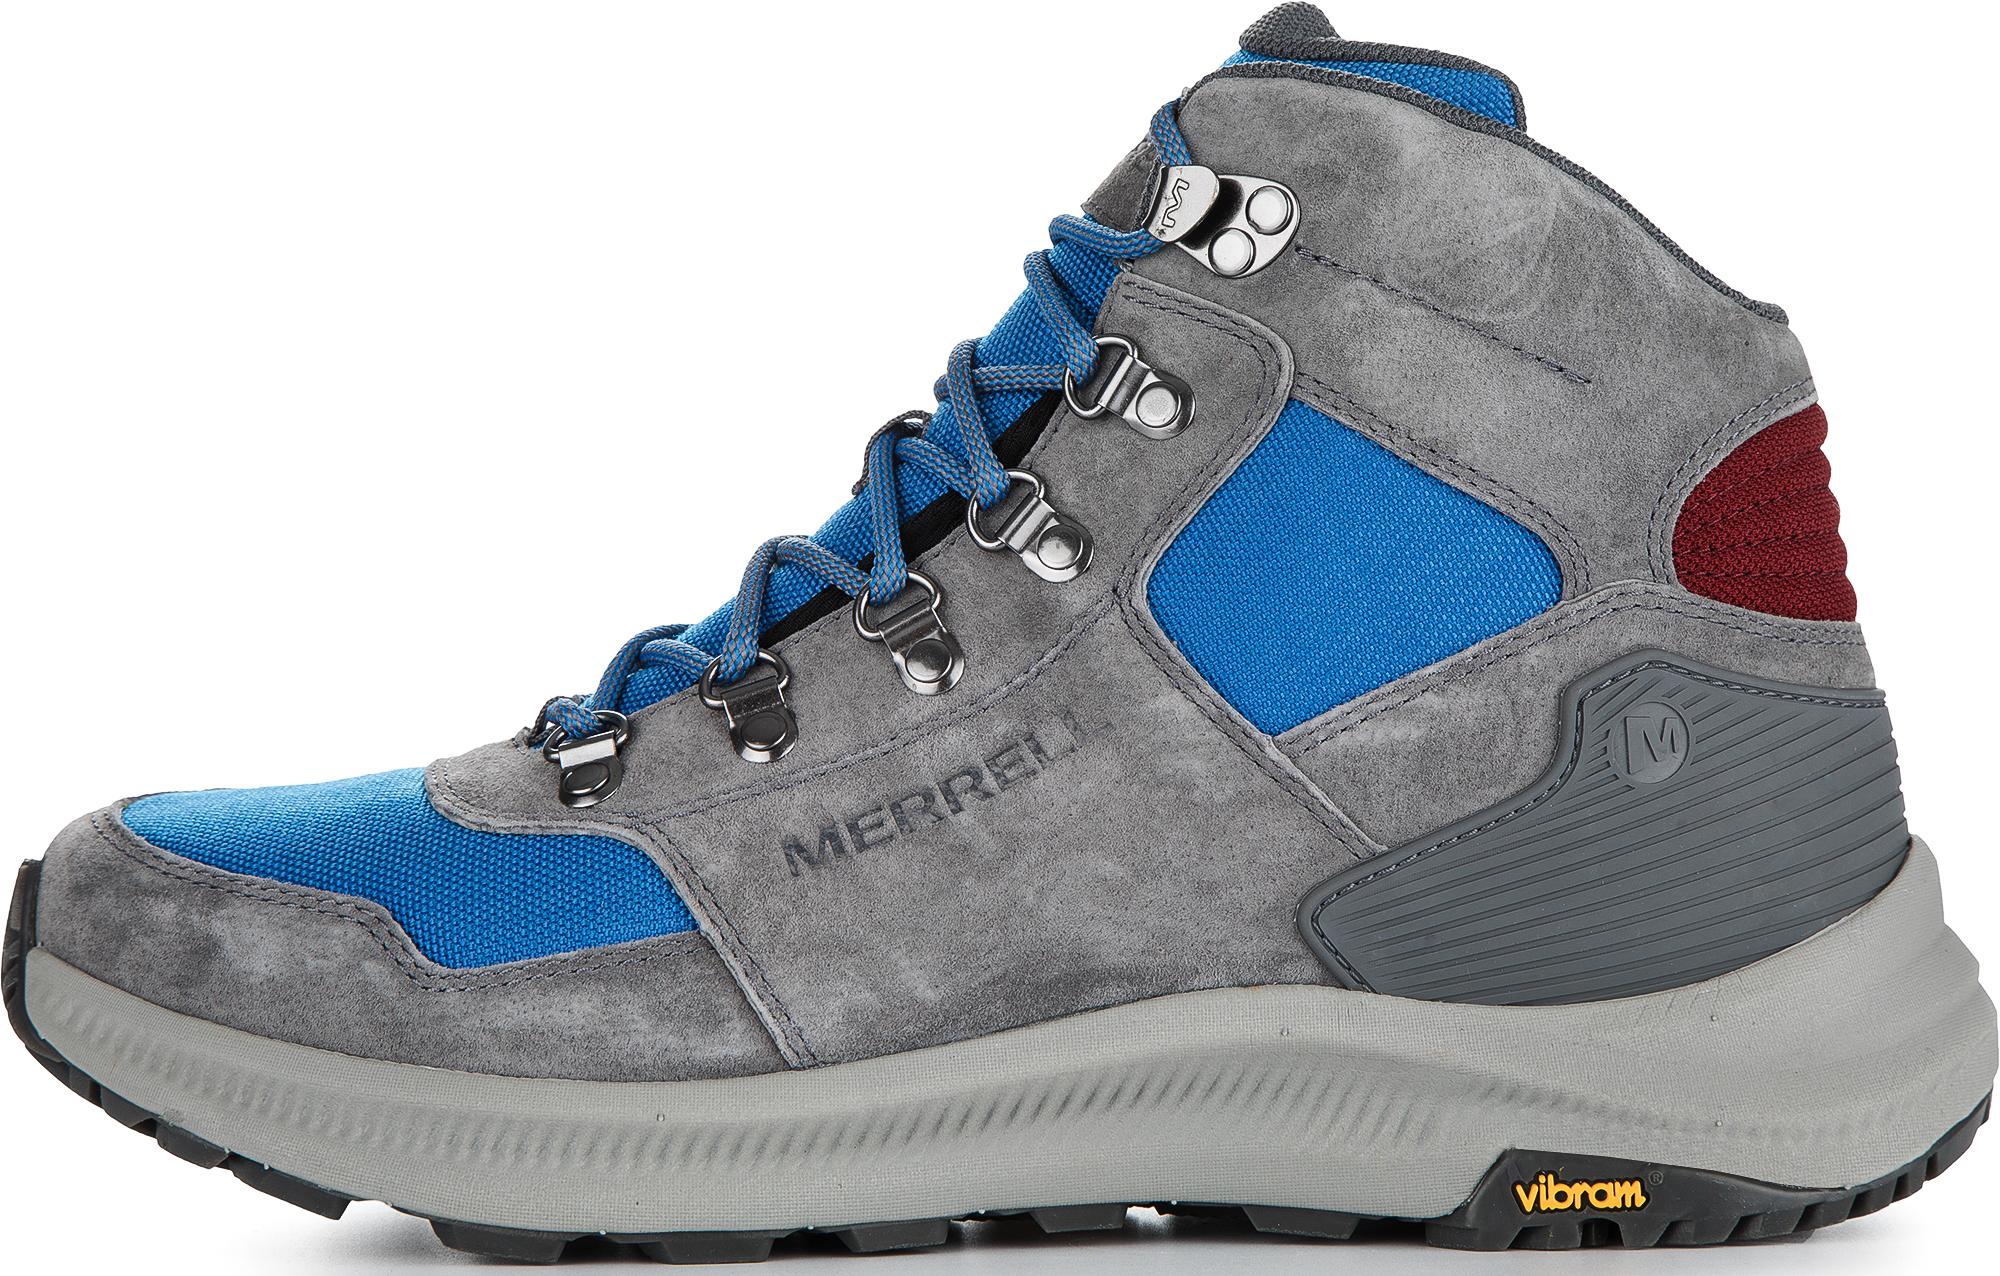 Merrell Ботинки мужские Ontario, размер 46,5